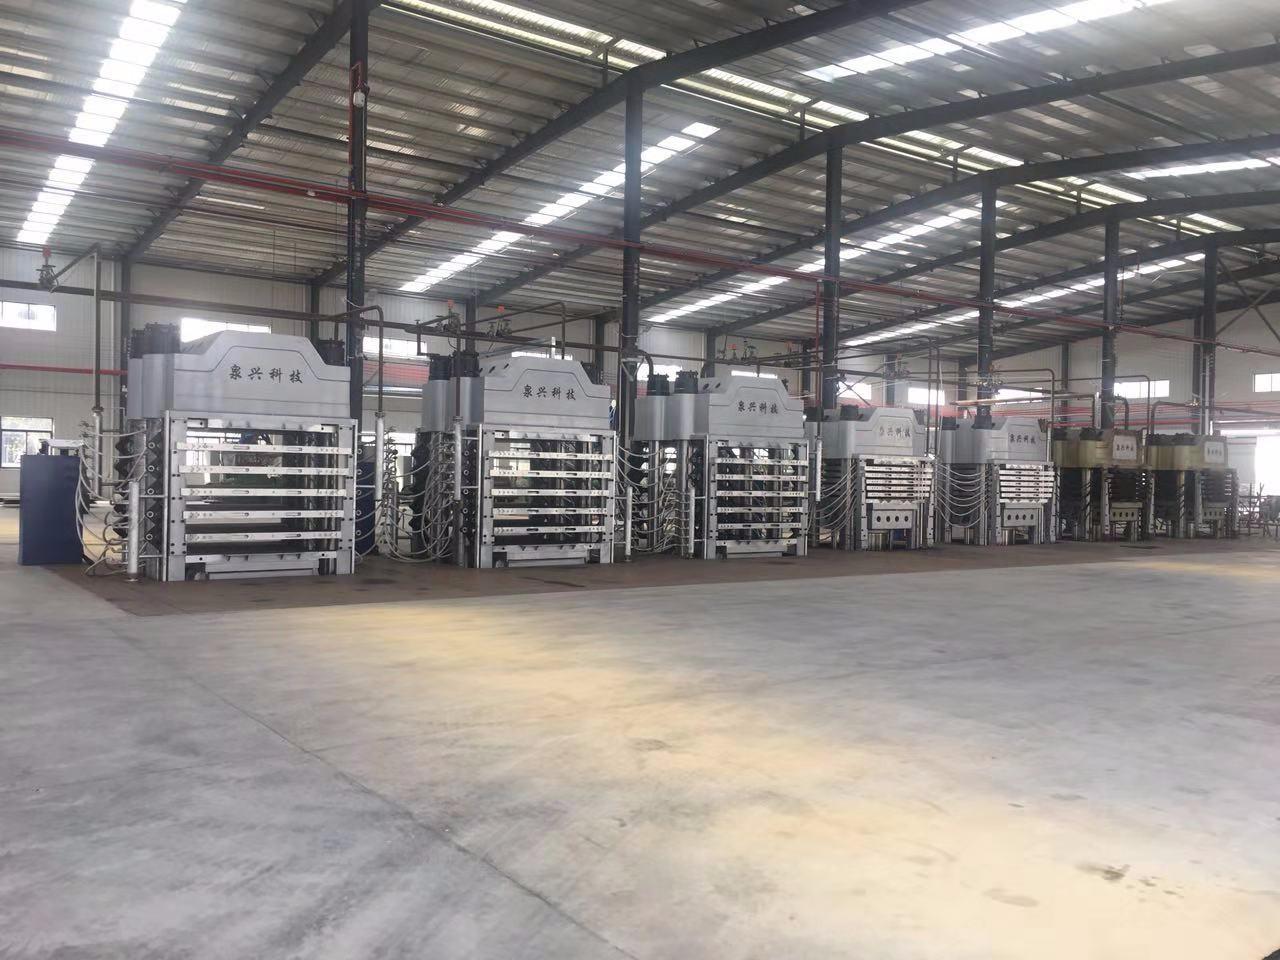 EVA flip flop sheet forming machine Manufacturers, EVA flip flop sheet forming machine Factory, Supply EVA flip flop sheet forming machine